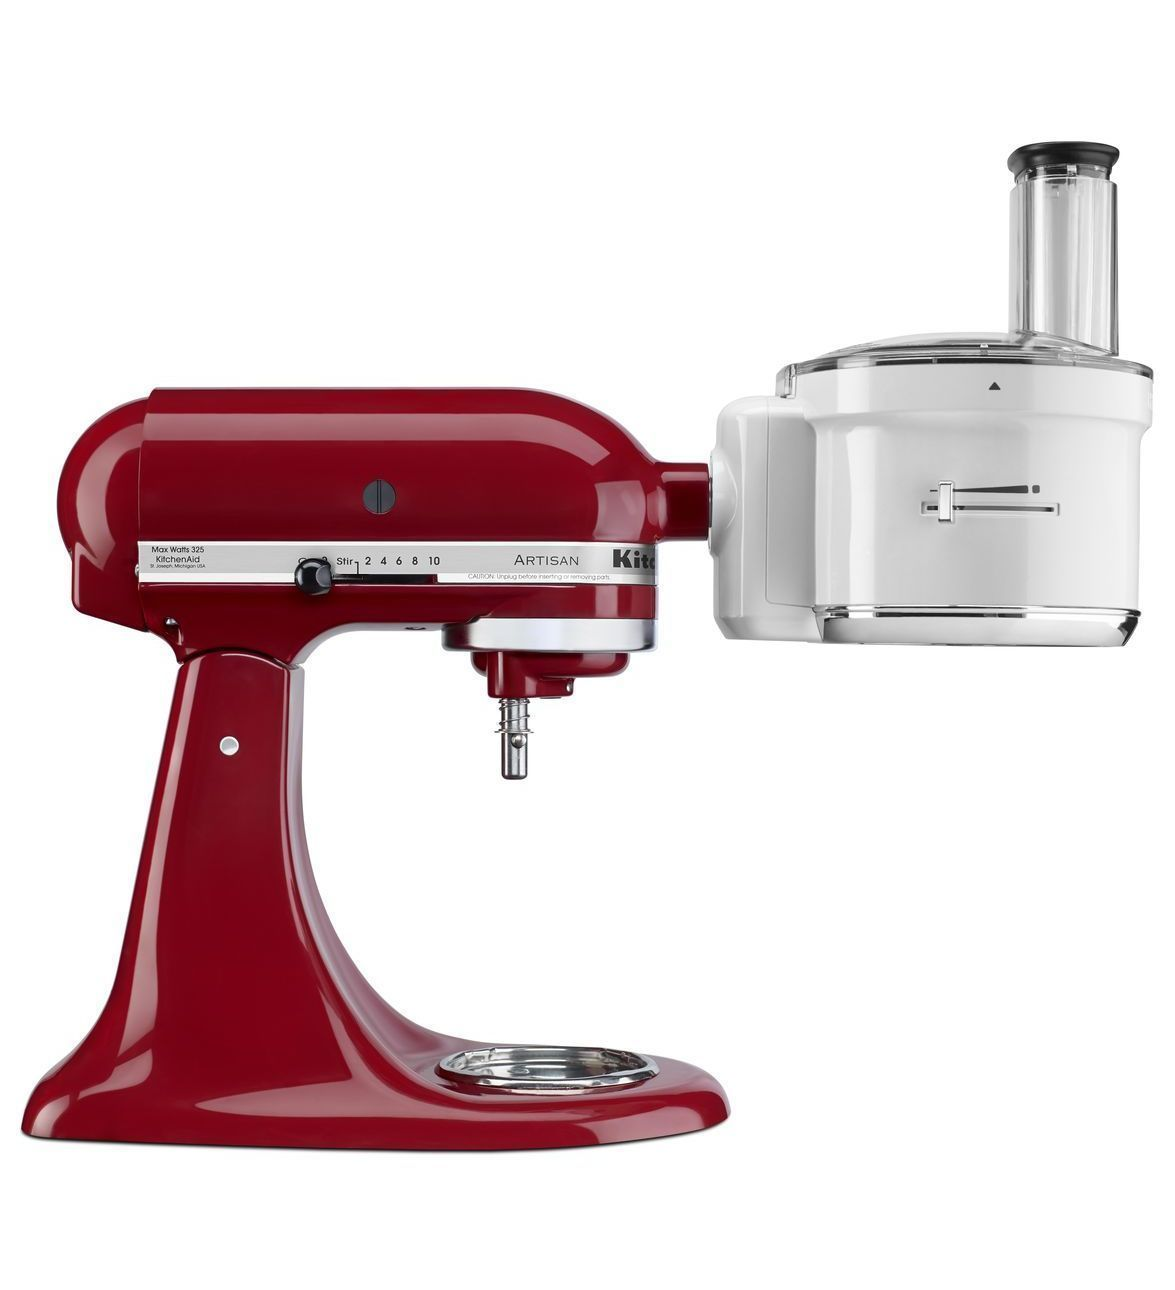 Kitchenaid exactslice food processor attachment rksm1fpa